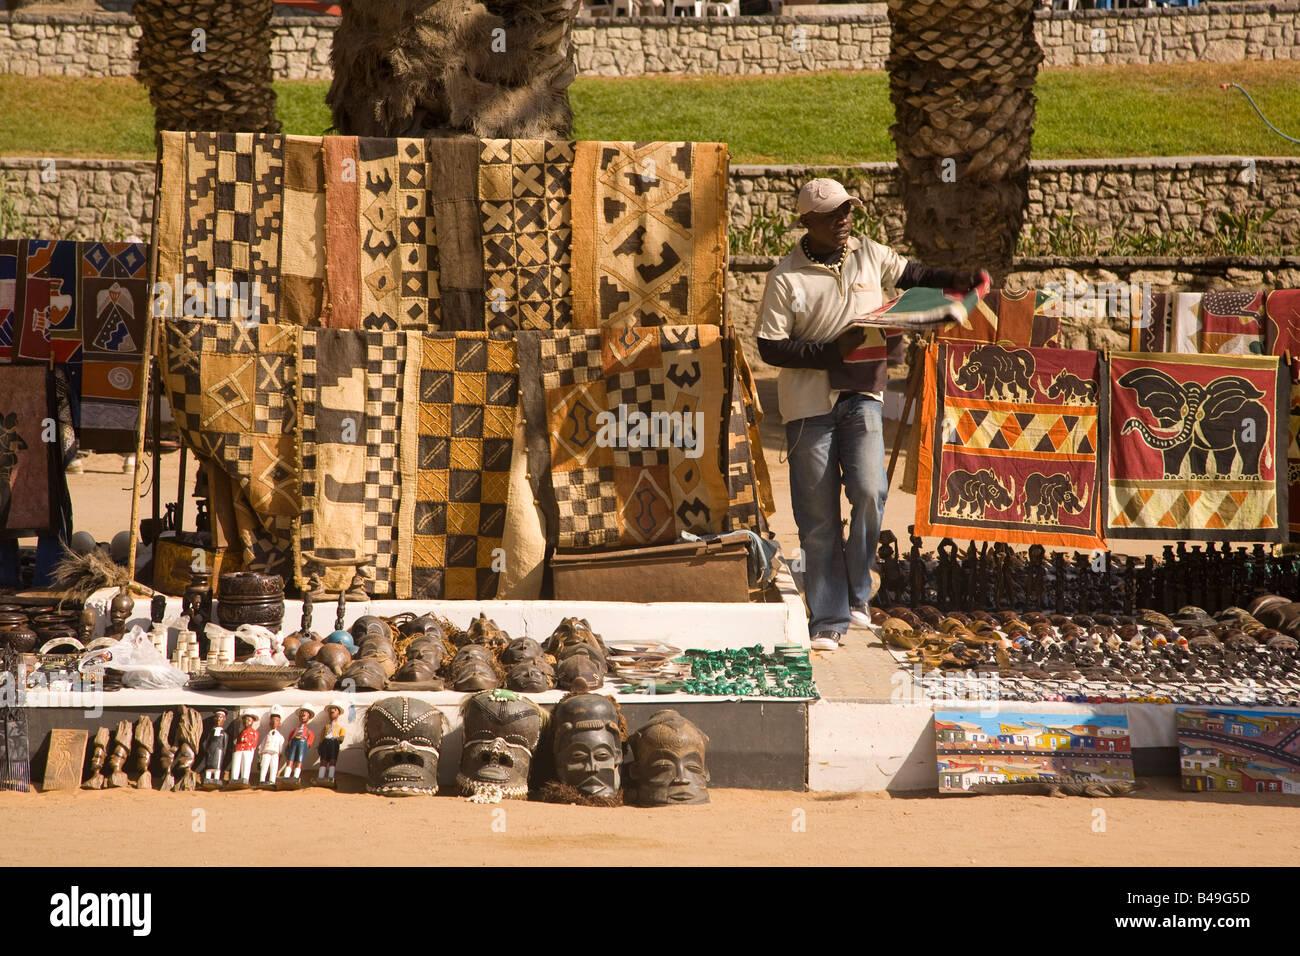 Craft Market Swakopmund Namibia - Stock Image